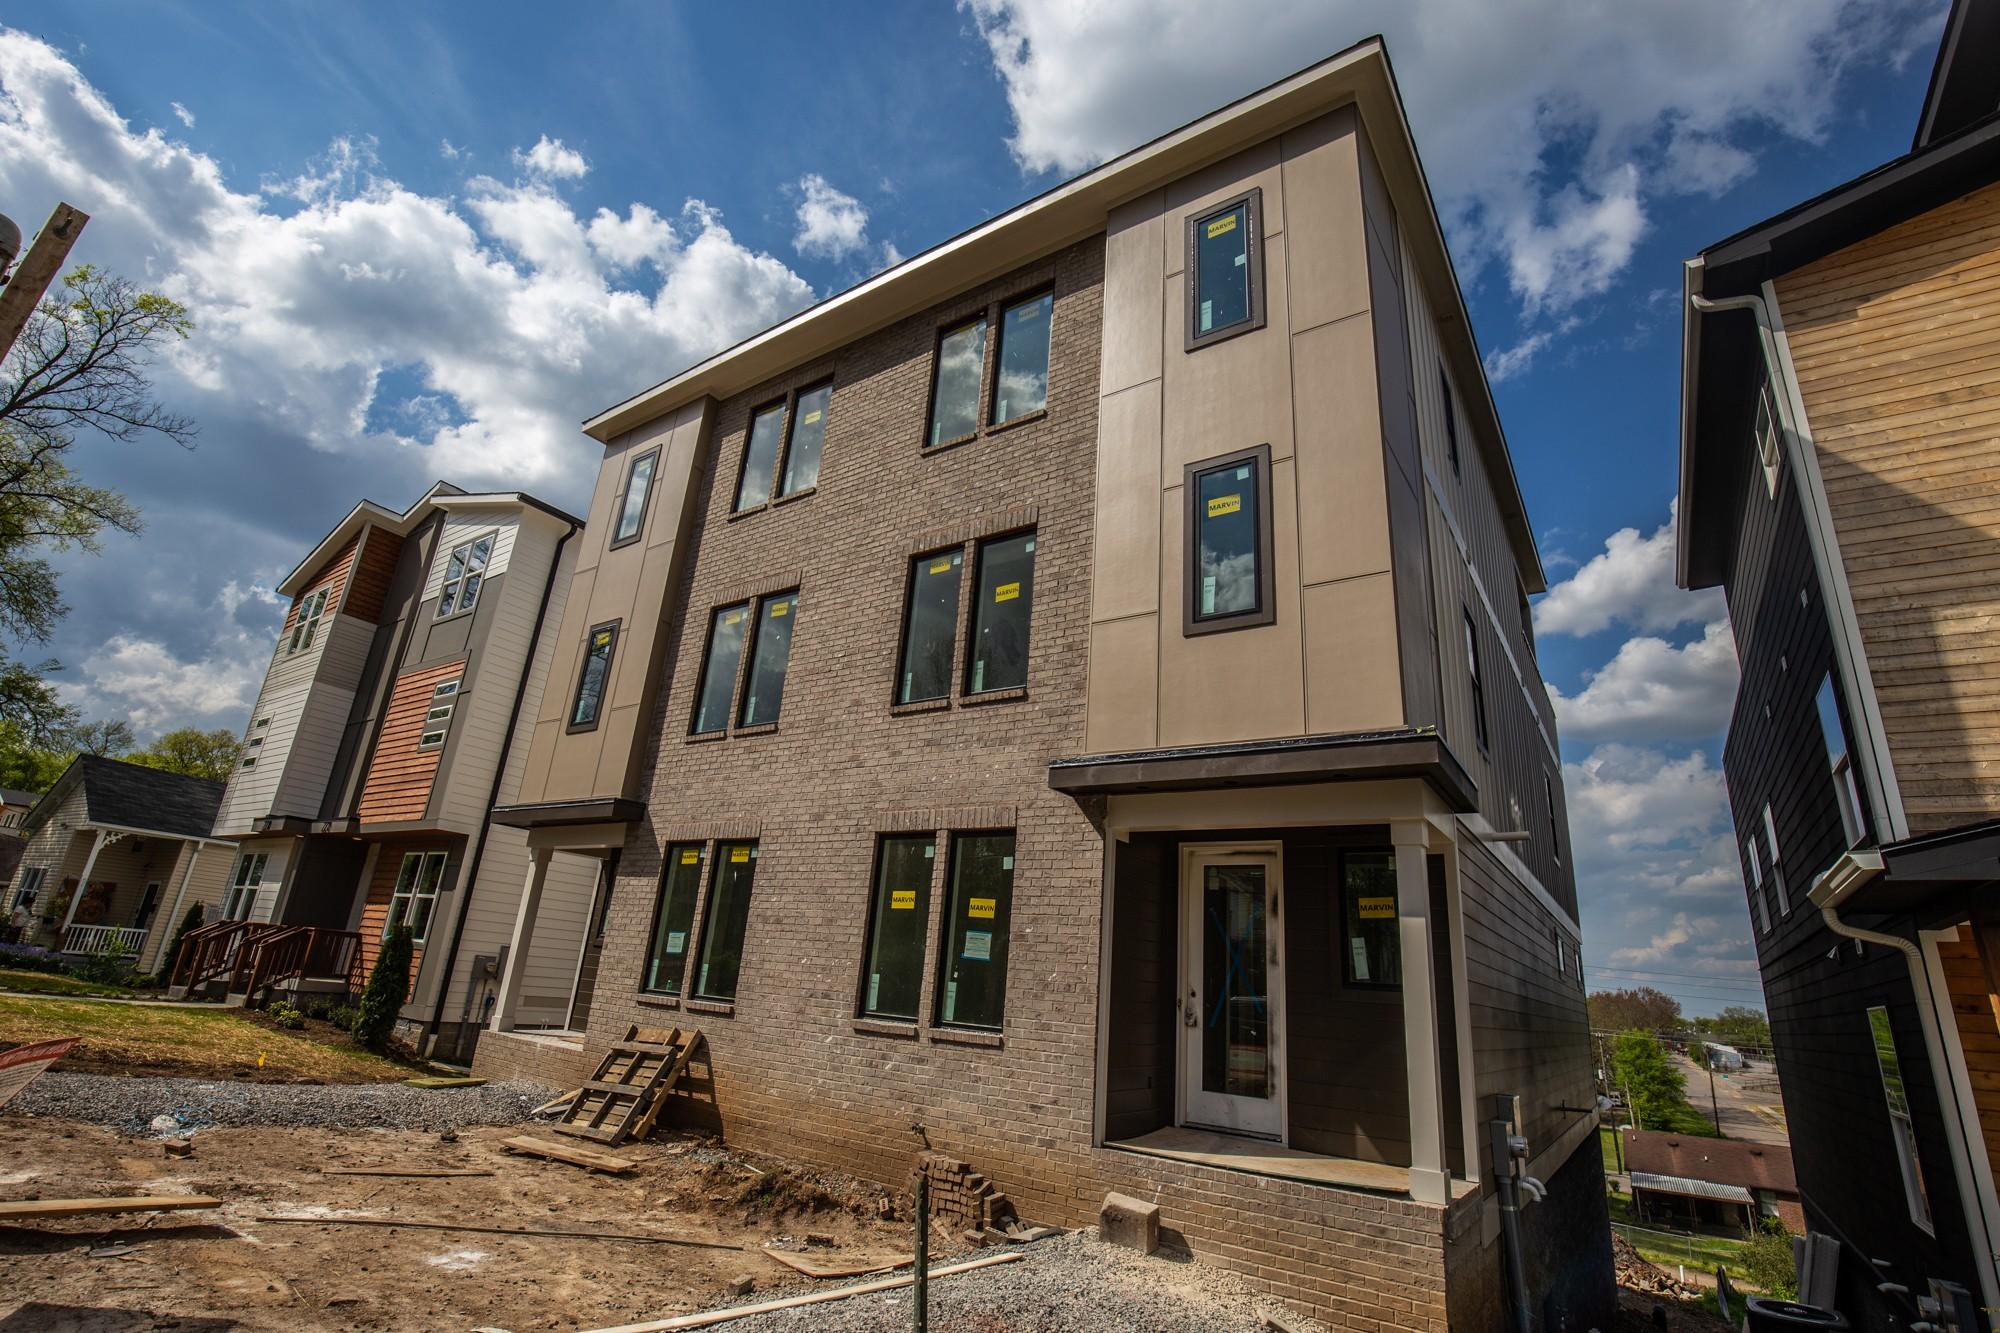 24 N Hill St, Nashville, TN 37210 - Nashville, TN real estate listing